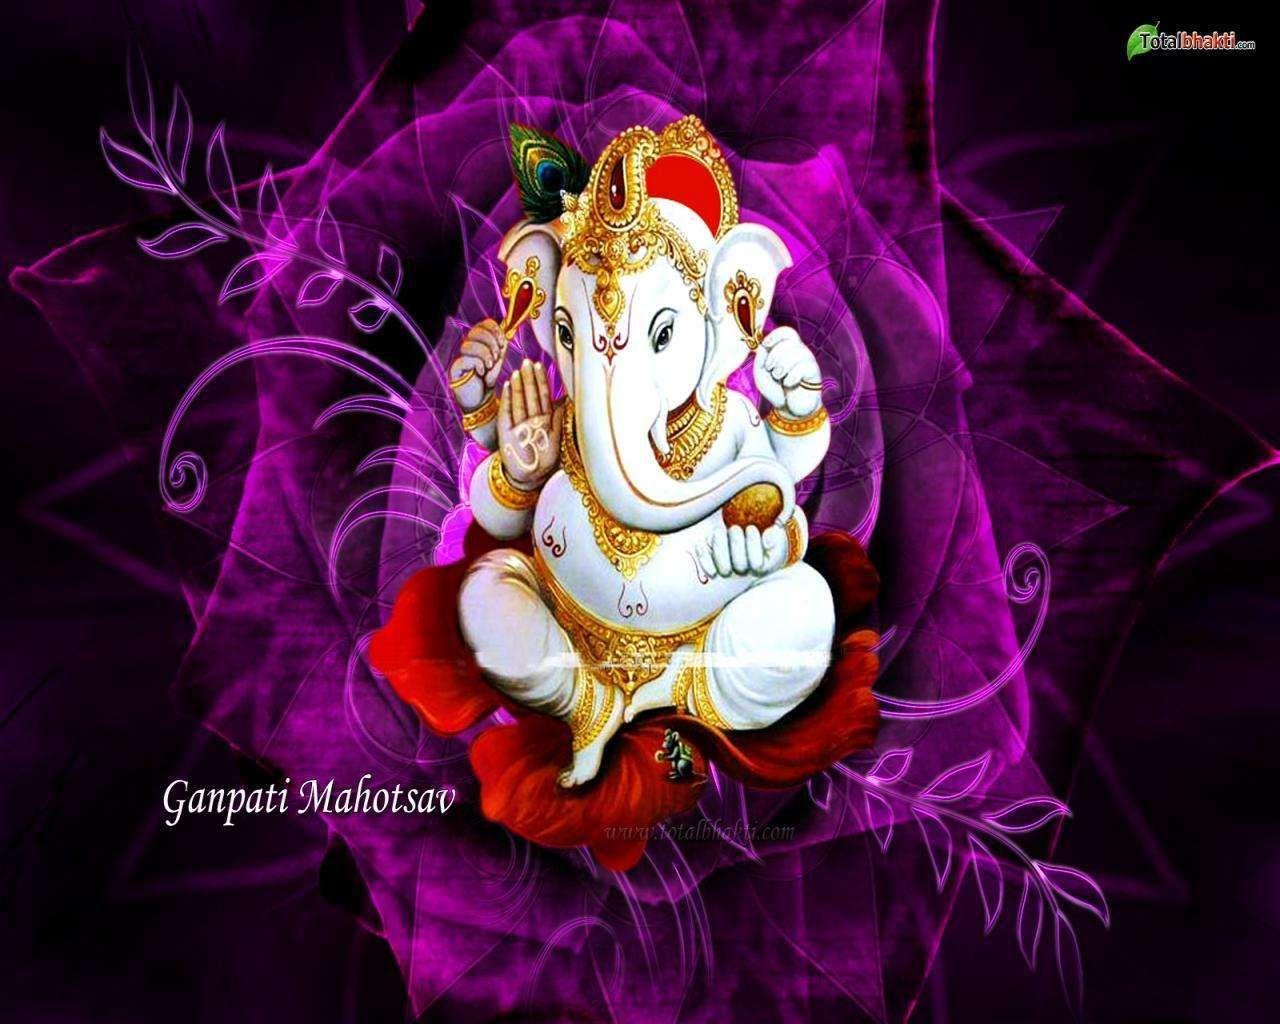 Riddhi Siddhi Ganesh Hd Wallpaper For Desktop Lord Ganesha Lord Ganesha Wallpaper Wallpaper Pc